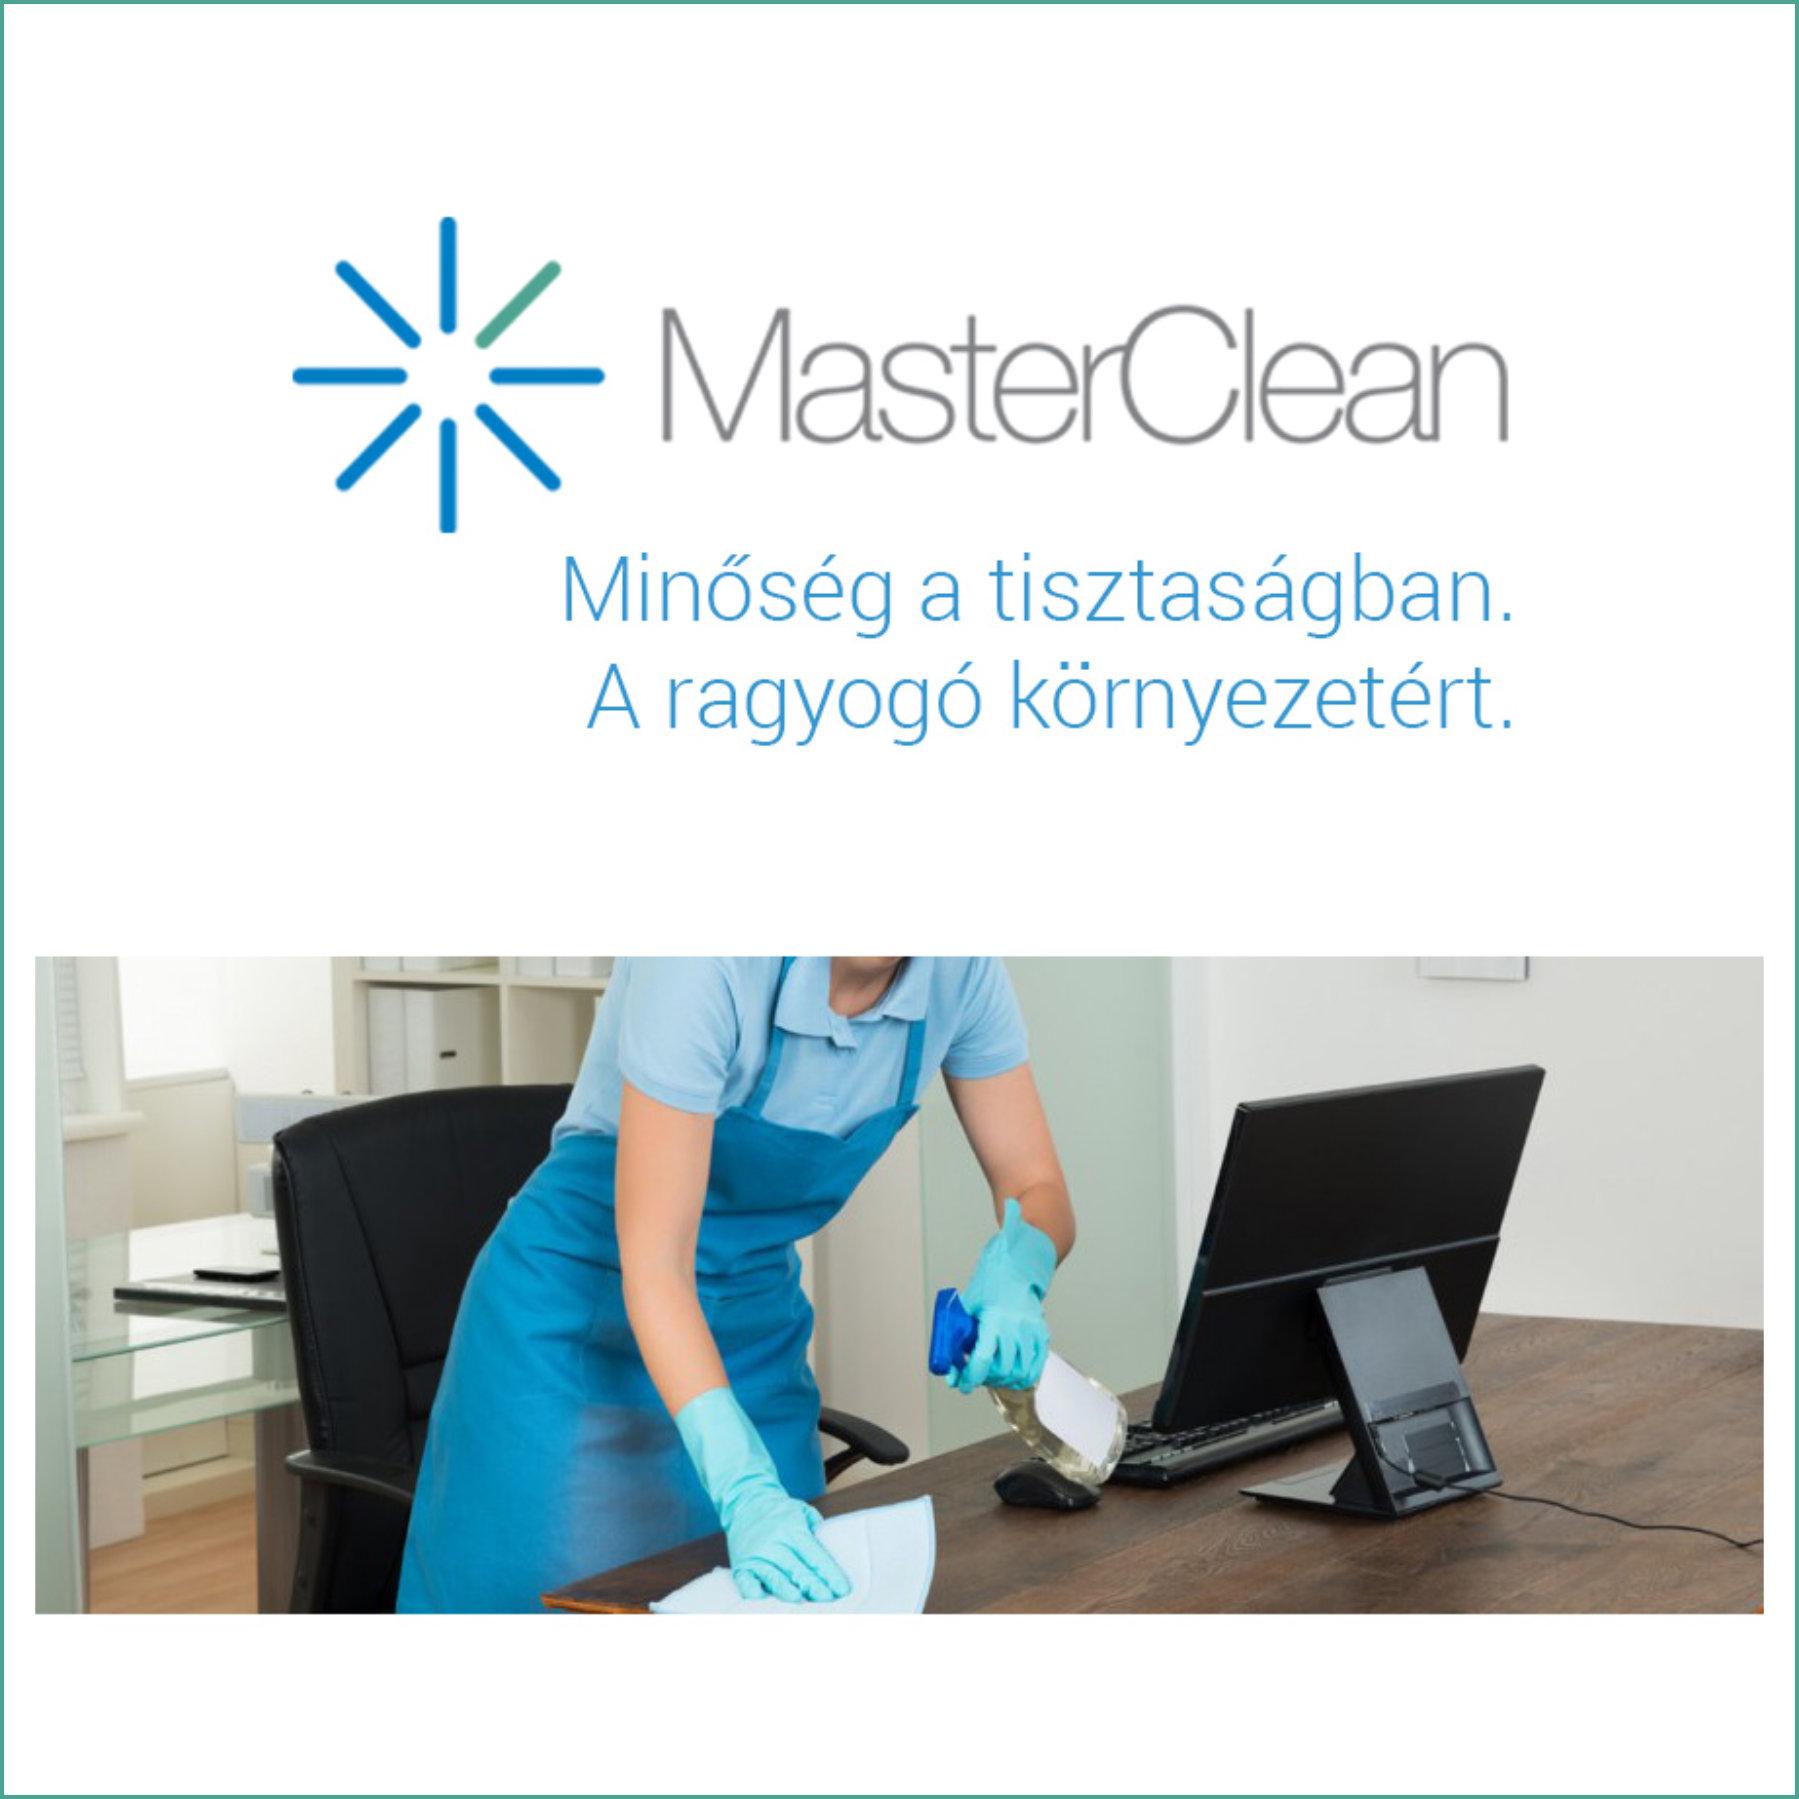 masterclean5.jpg